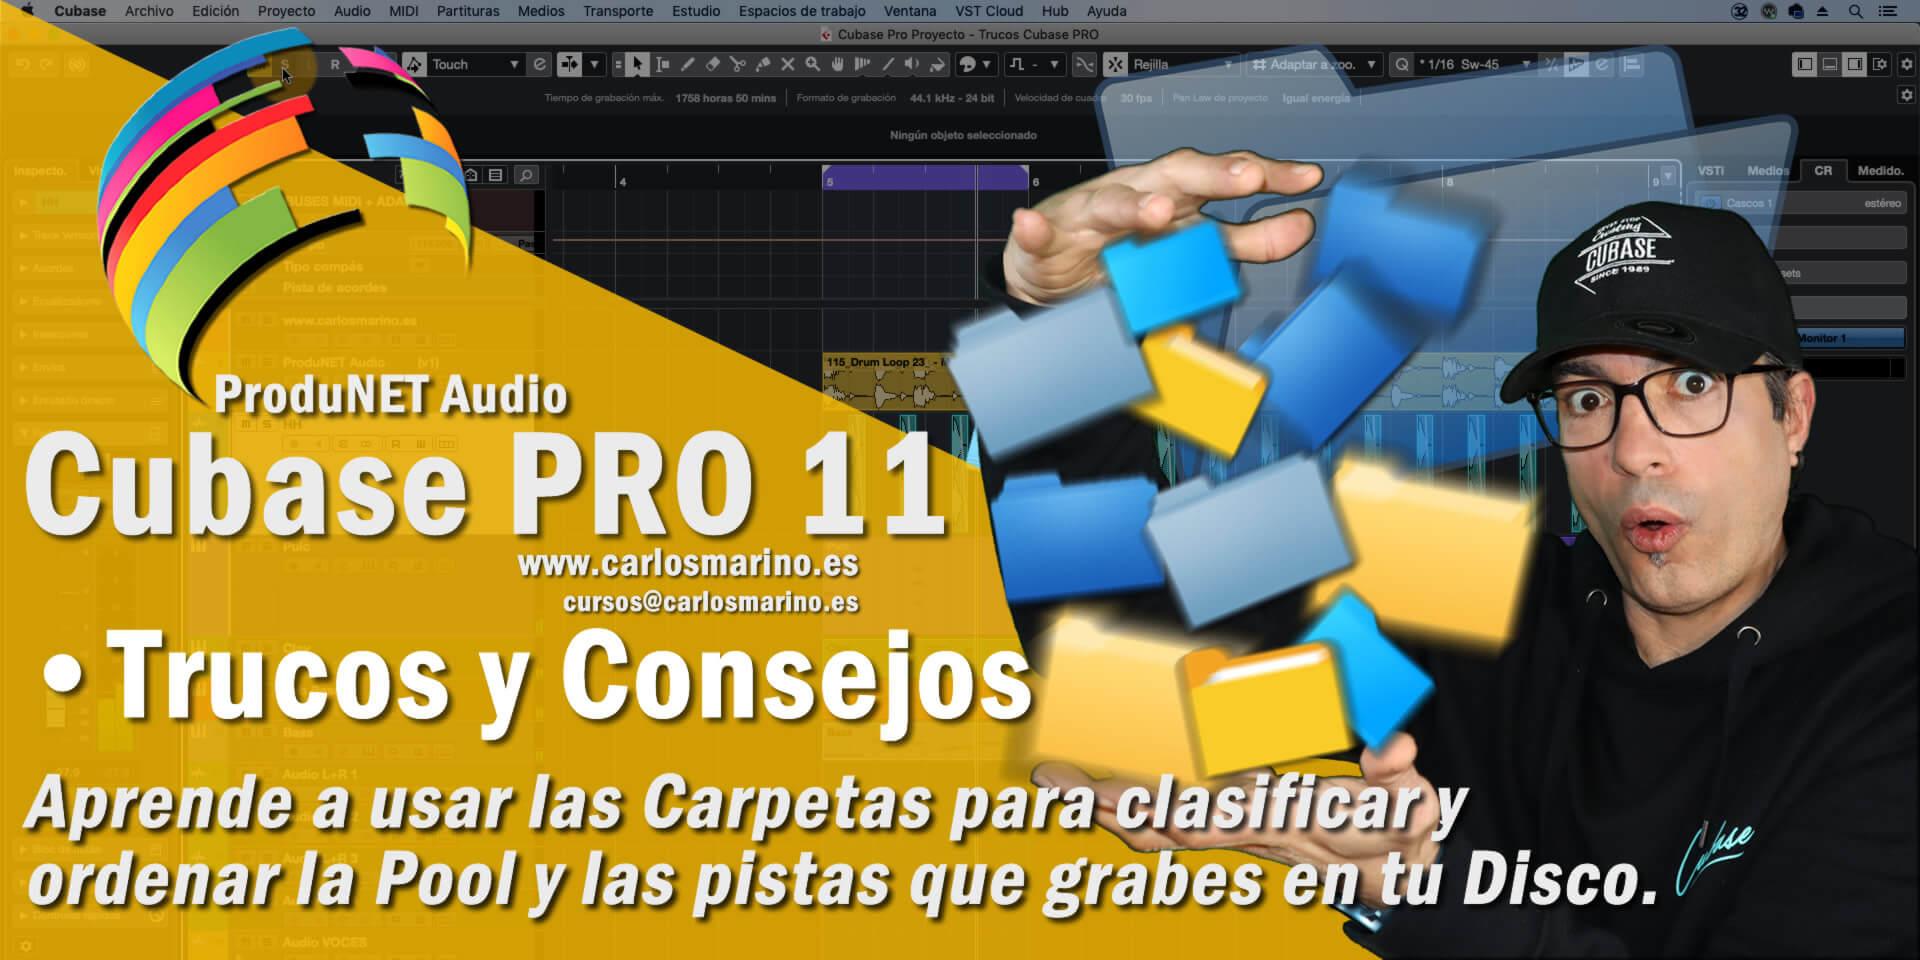 folder-pool-help-auida-trucos-tips-copnsejos-steinberg-cubase-11-pro 1-novedades-funciones-produnet-audio-carlos-maiño-marino-formacion-cursos-tutorial-español-formation-waves-audio-full